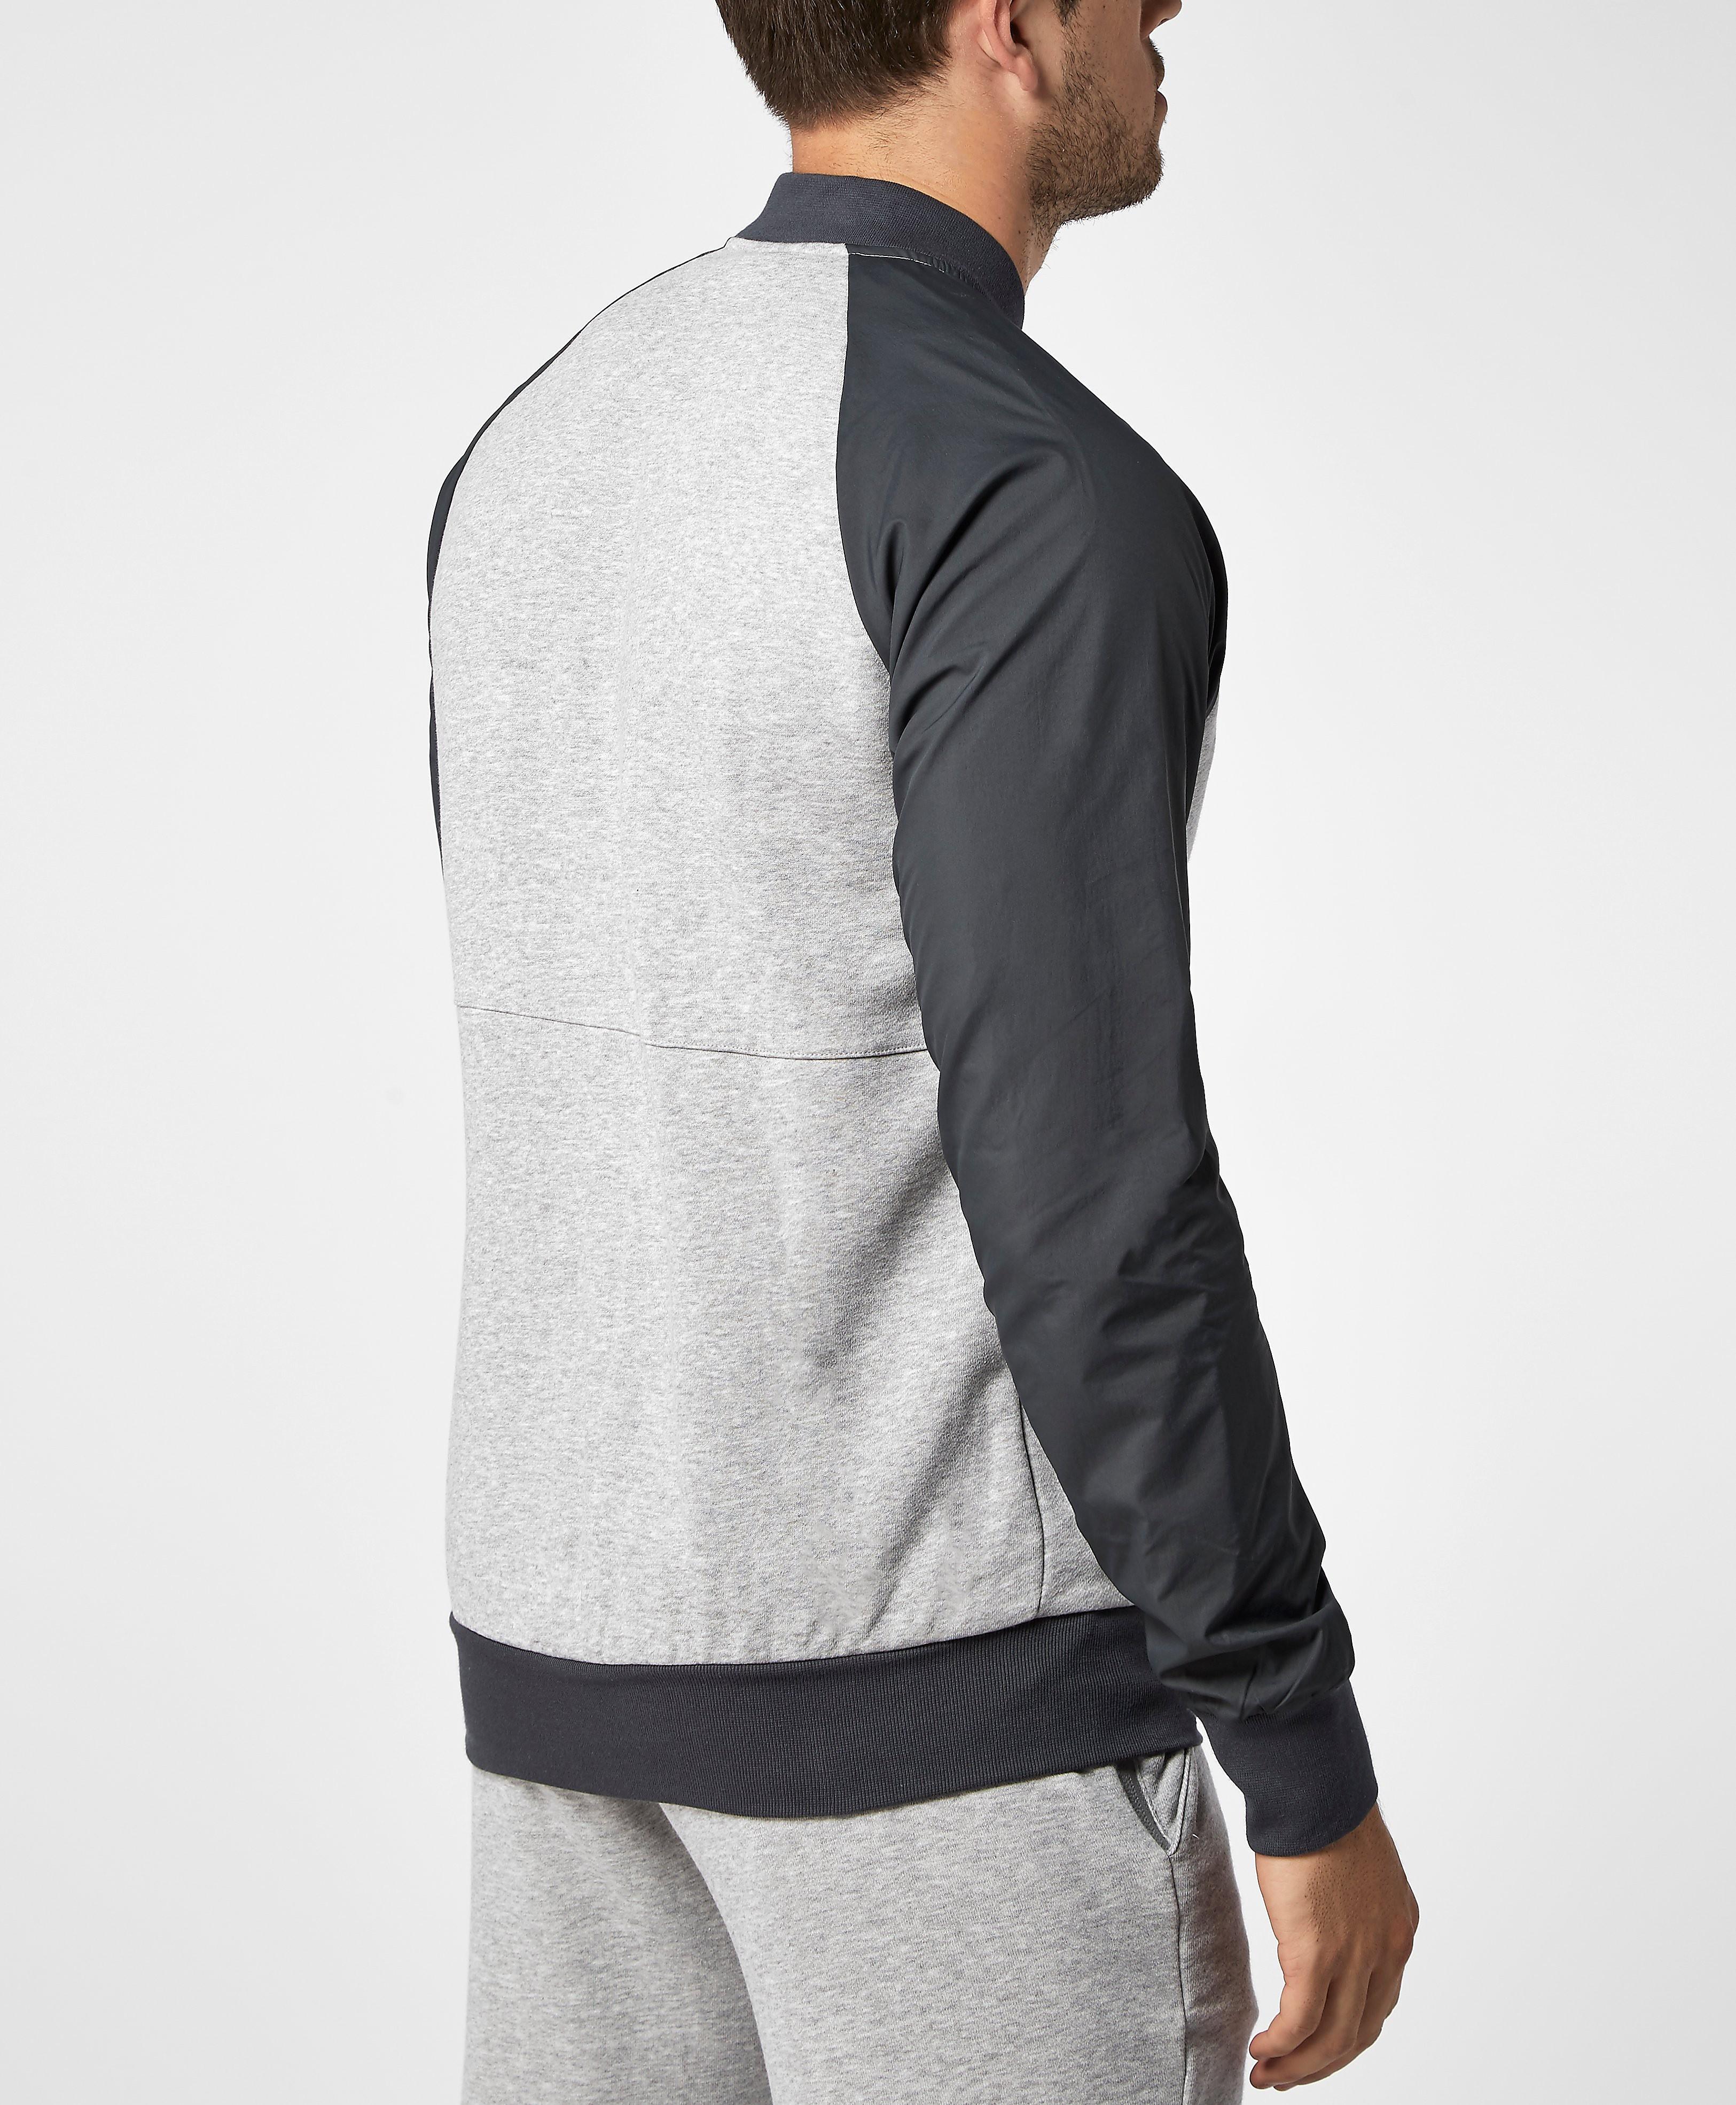 adidas Originals Sport Luxe Track Top